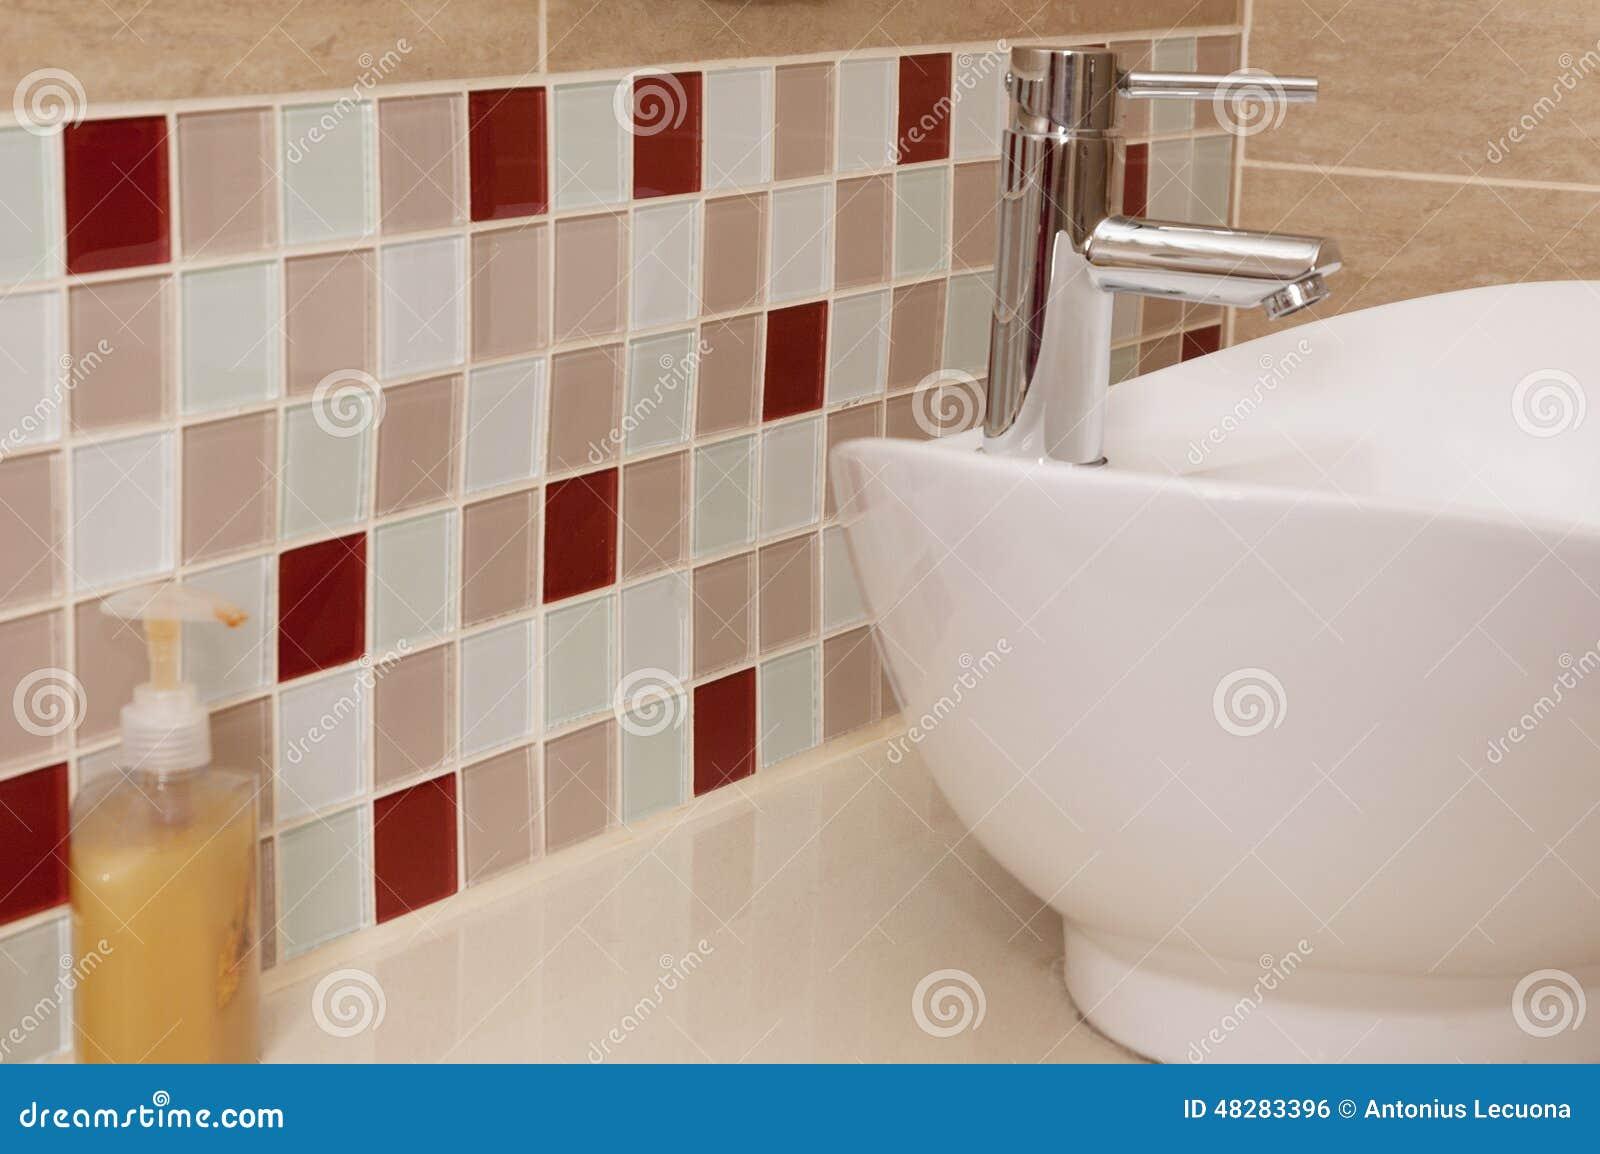 Classic Bathroom Sink With Coloured Mosaic Splashback